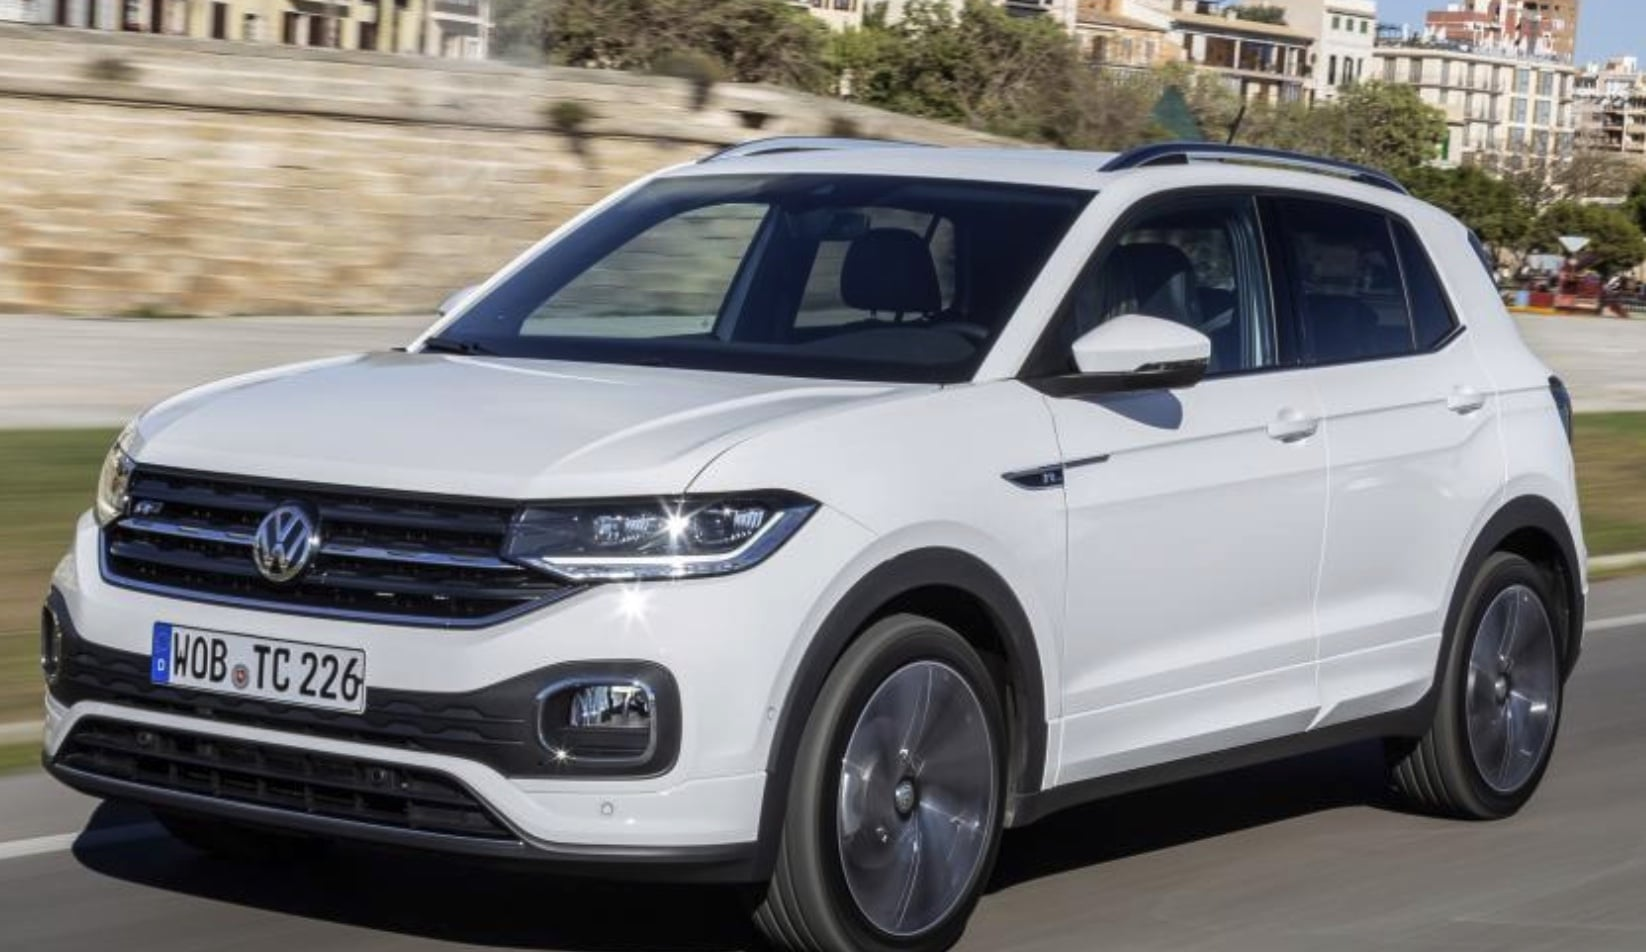 VW T Cross 1.0 Style Leasingmarkt Privatleasing